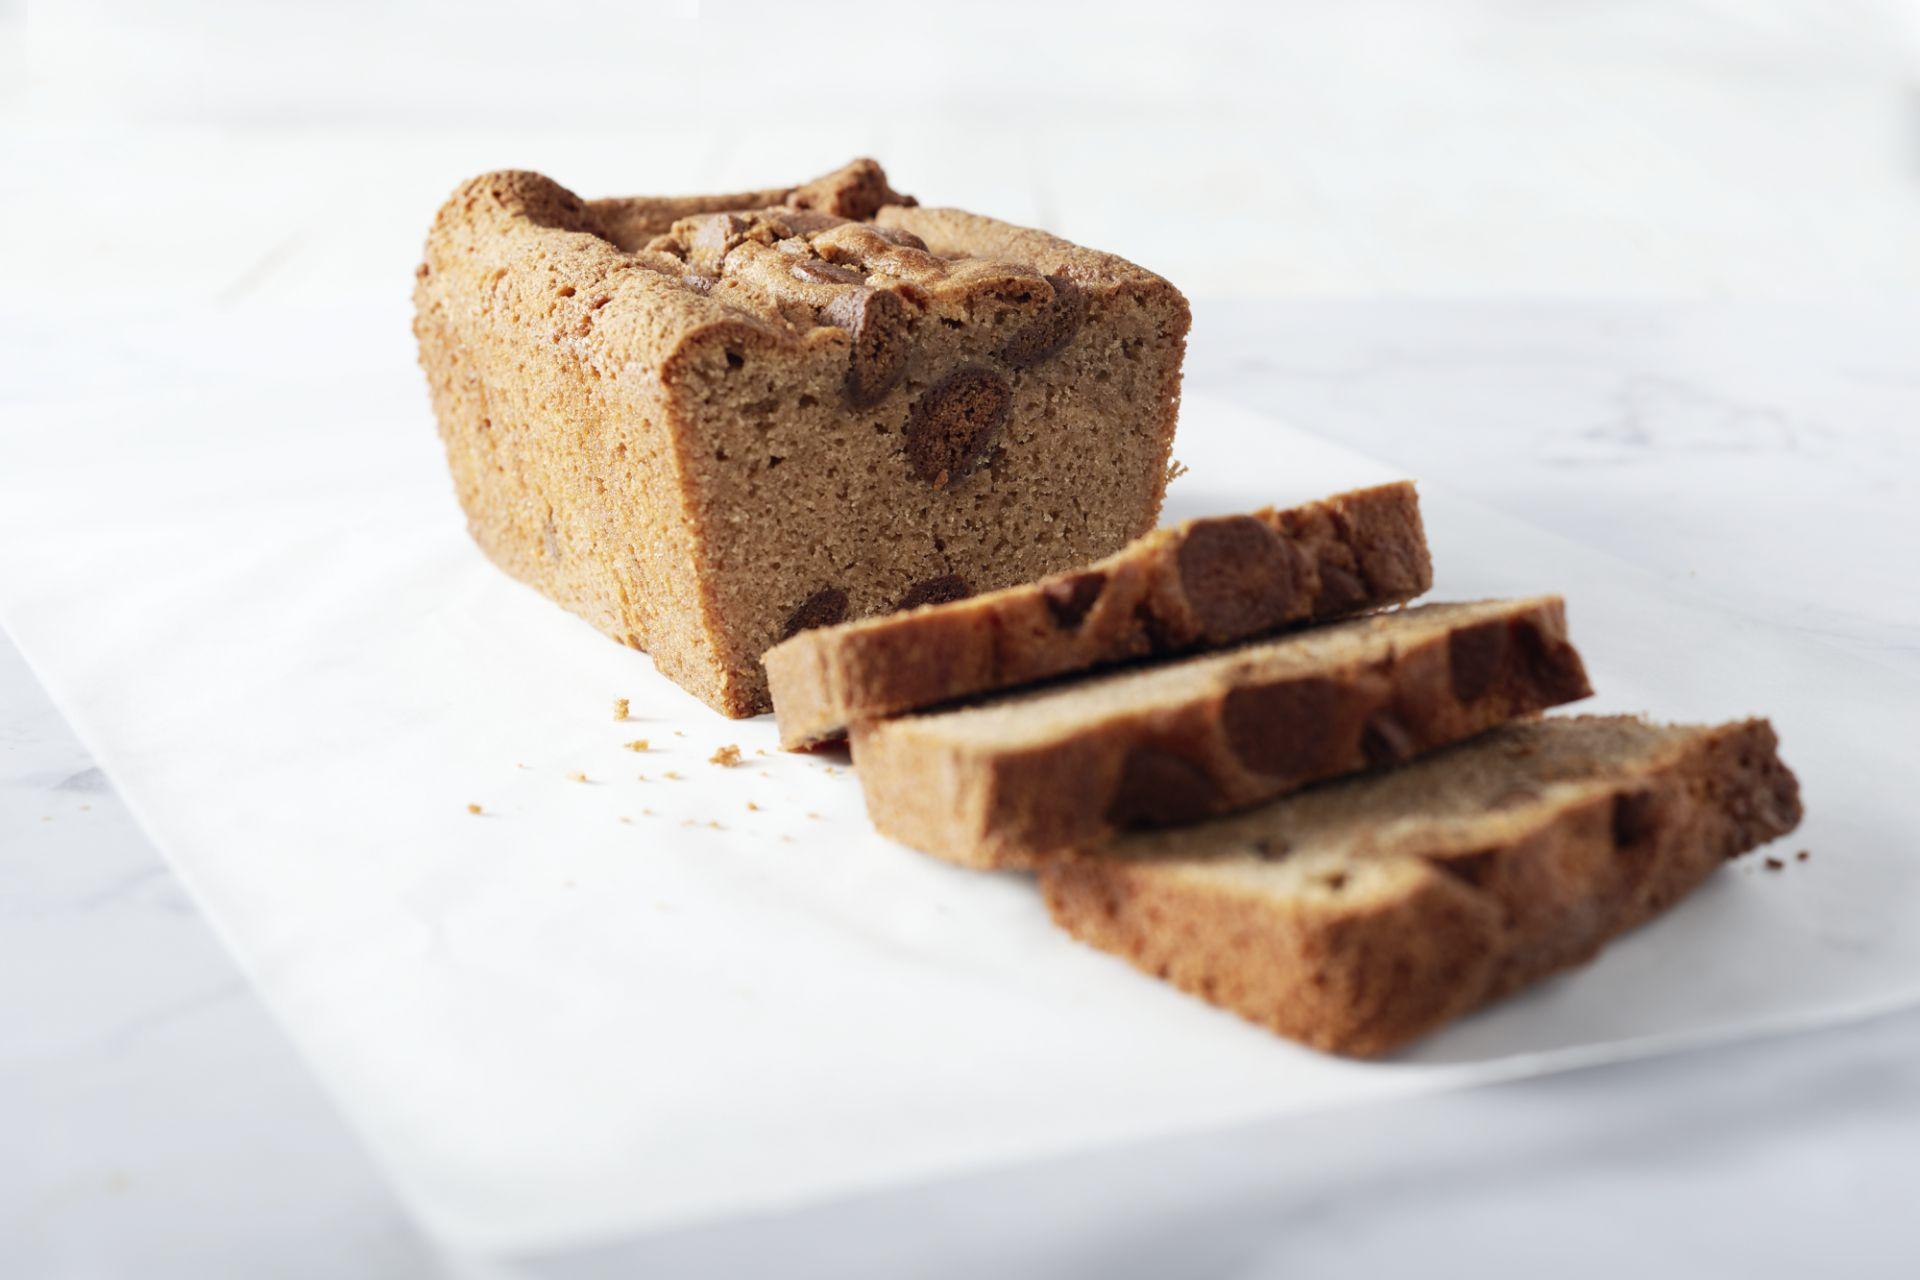 Speculaascake met kruidnoten